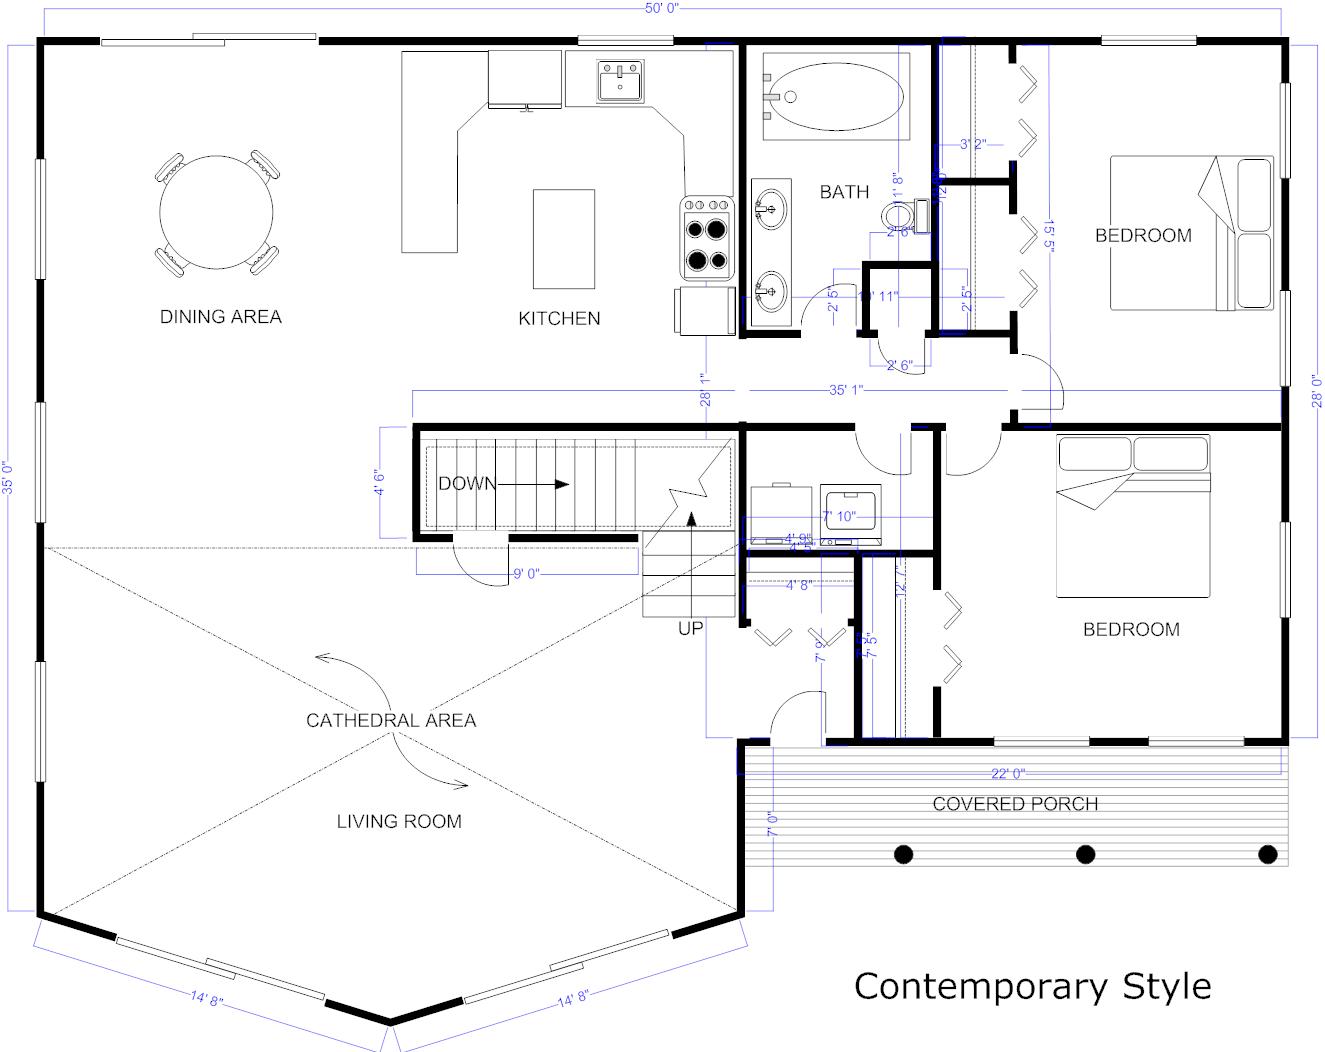 House Blueprint Software Interior Design Software Interior